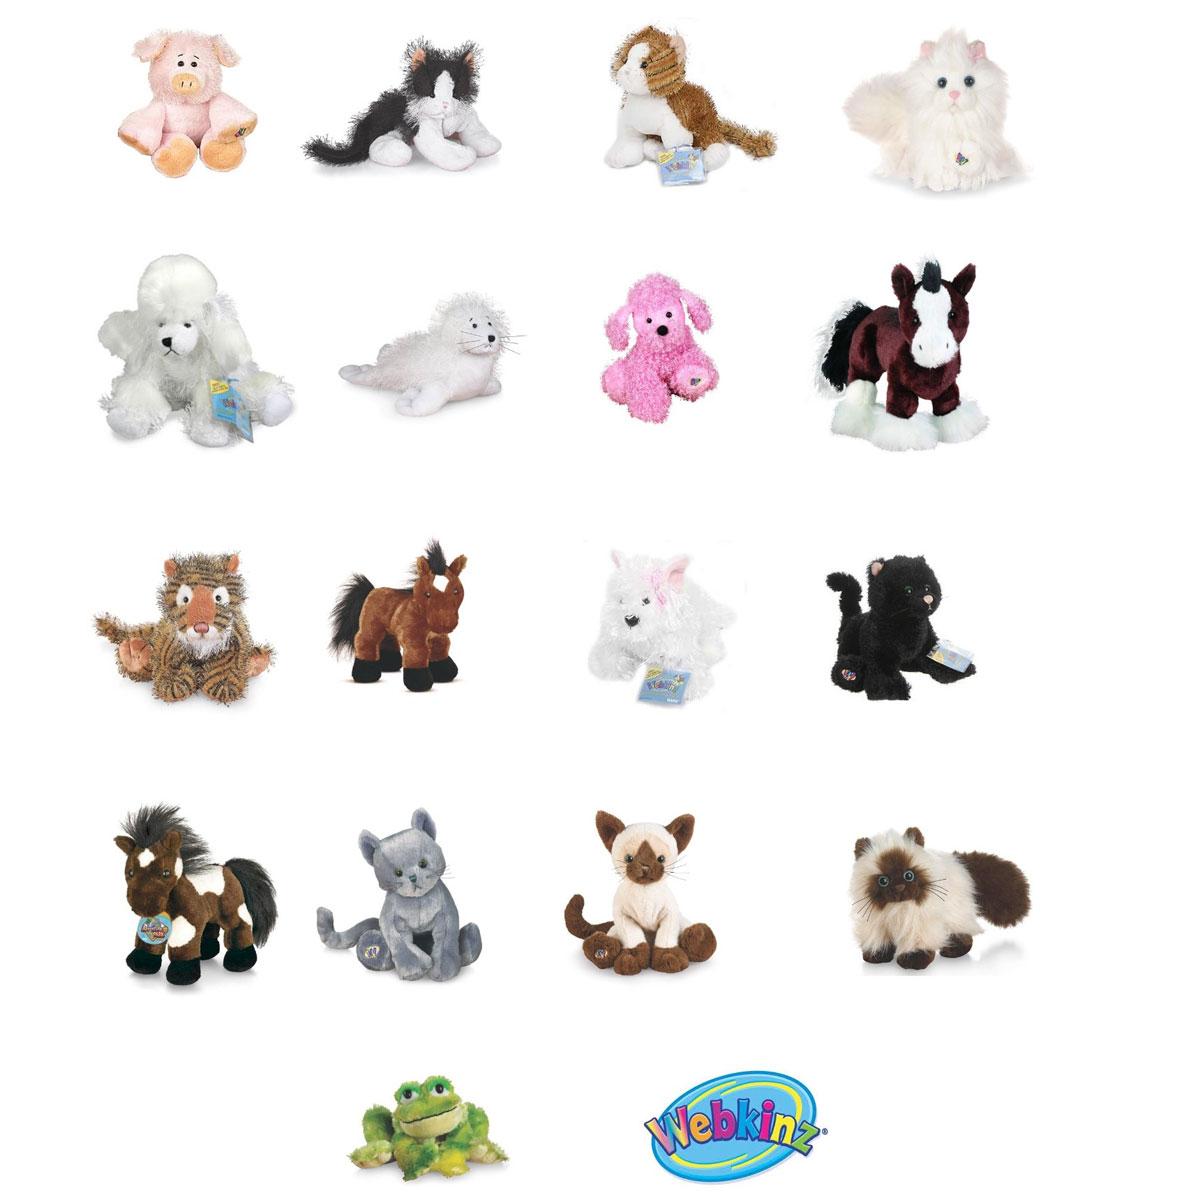 Webkinz: 15 Plush Pets for $2.47 Each Shipped (Lowest ...  Webkinz: 15 Plu...